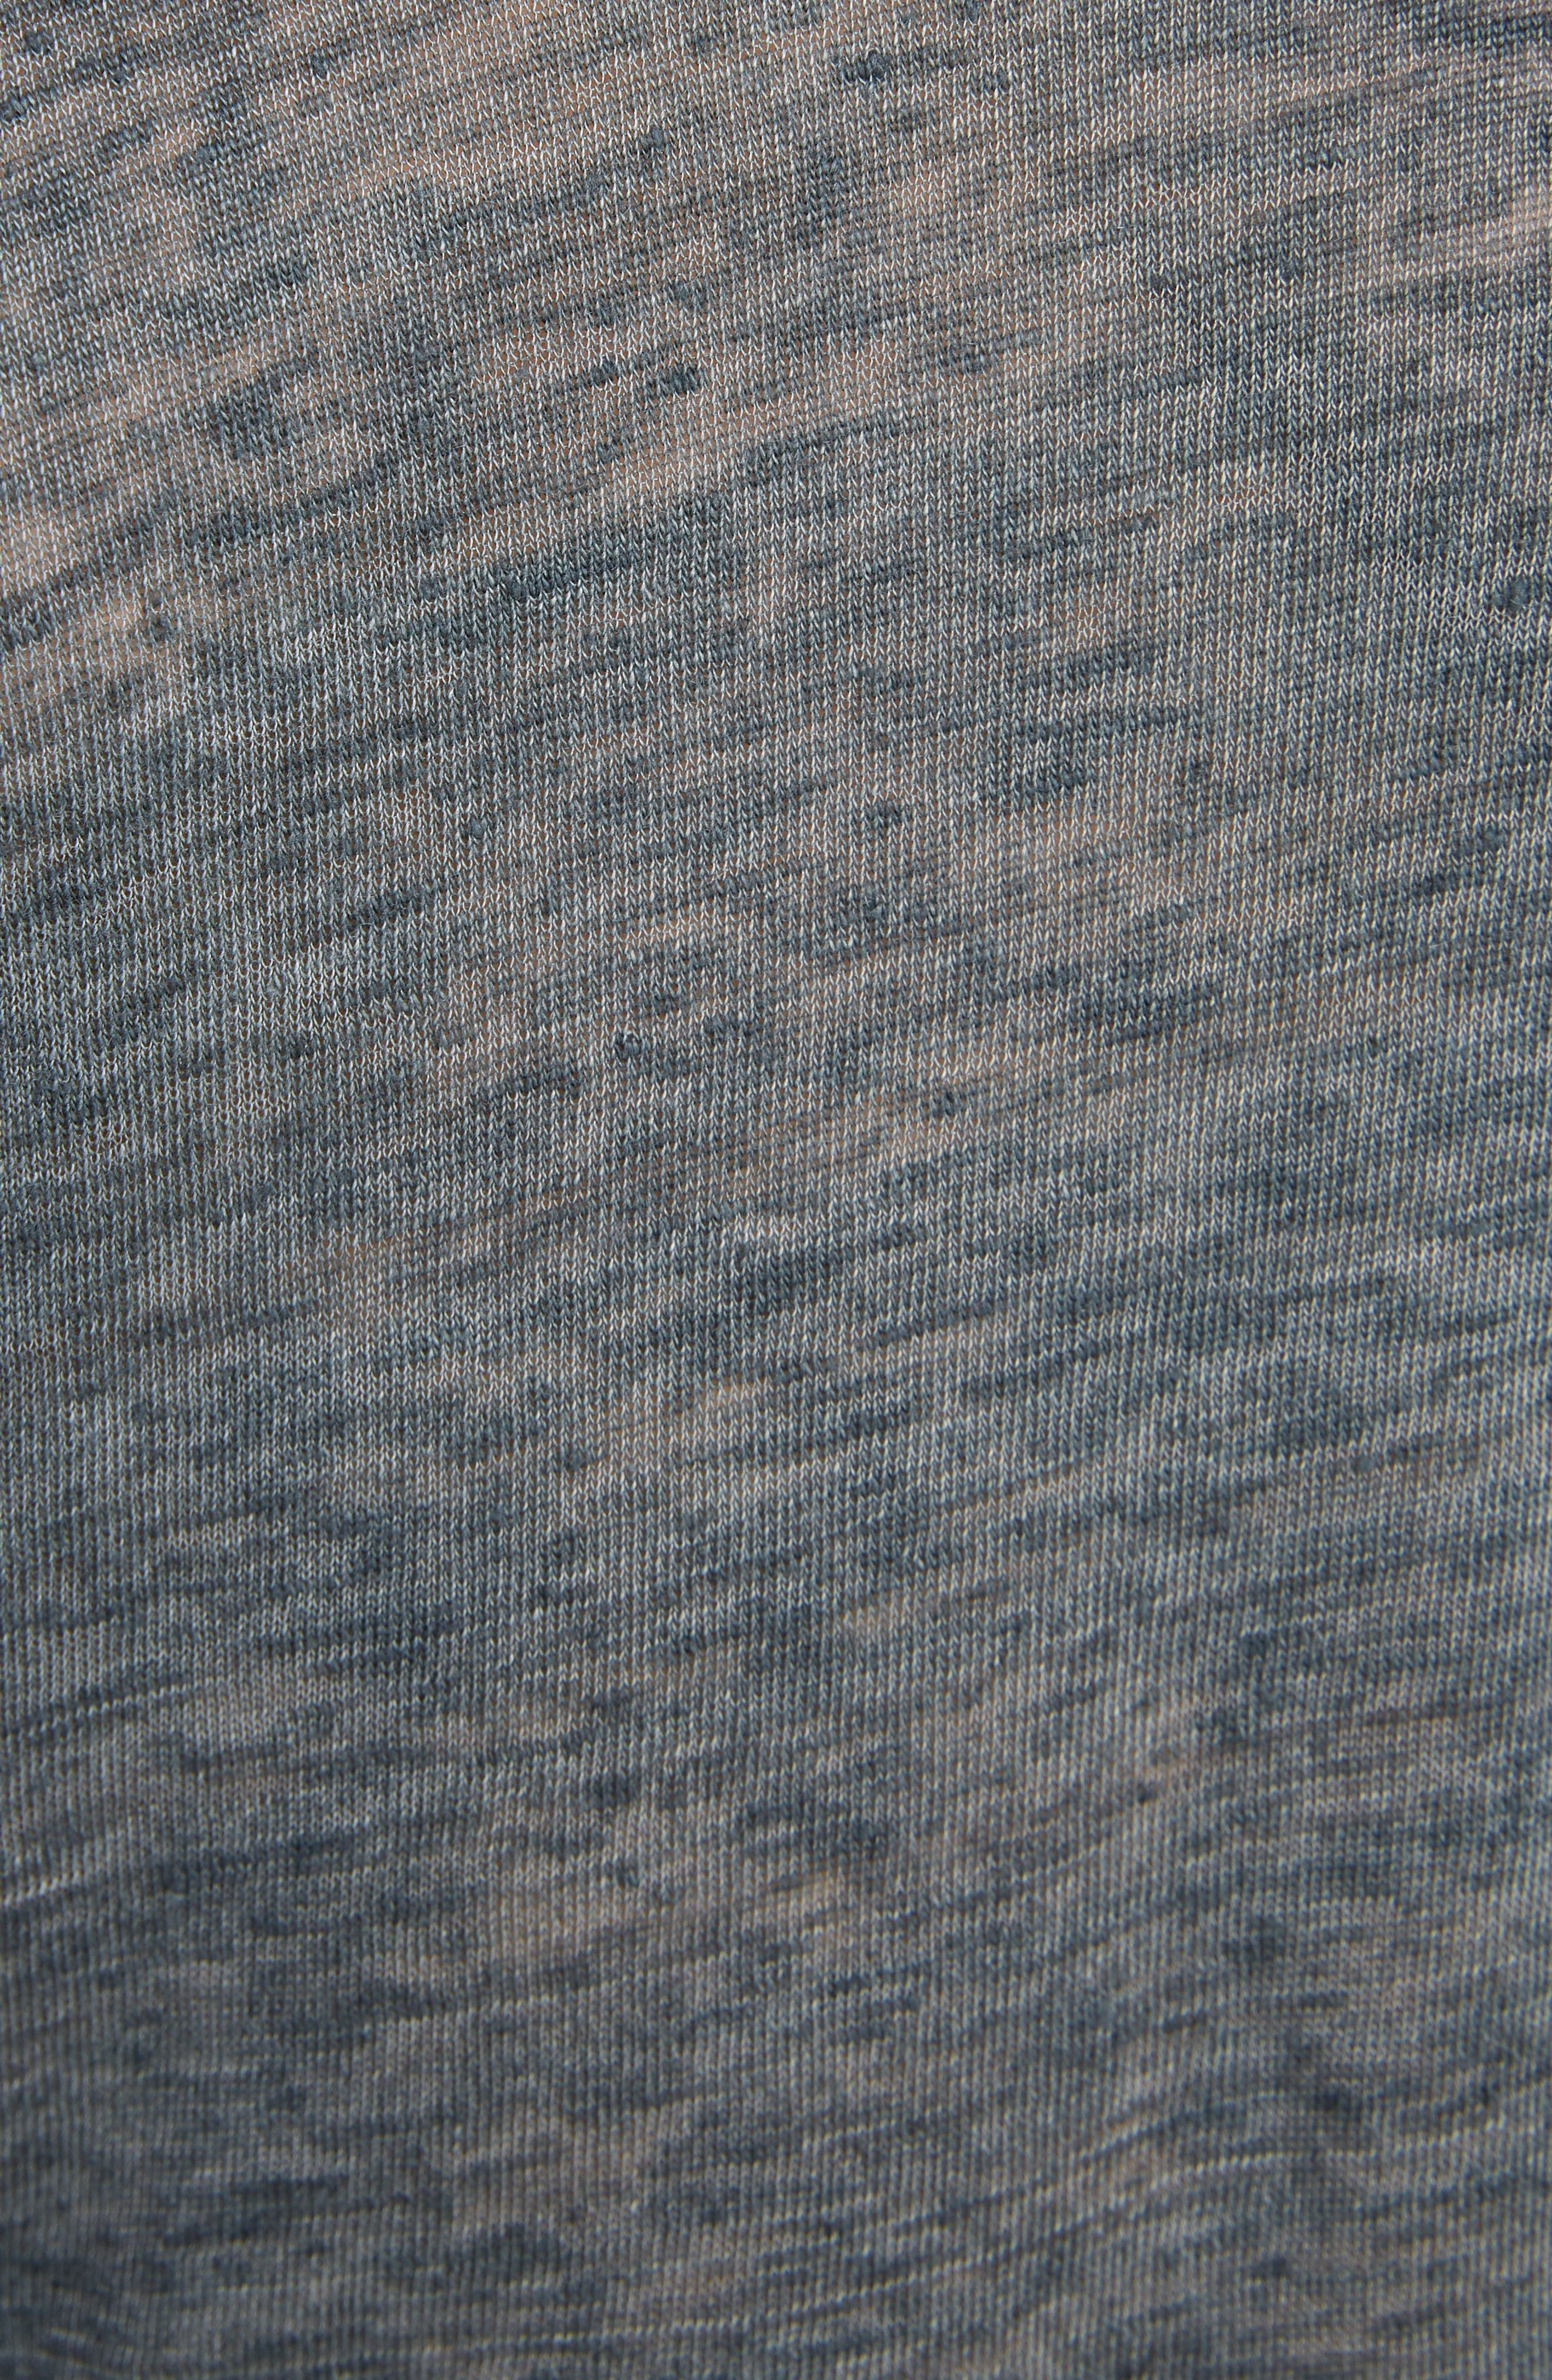 Linen Scoop Neck Tank Top,                             Alternate thumbnail 5, color,                             GREY